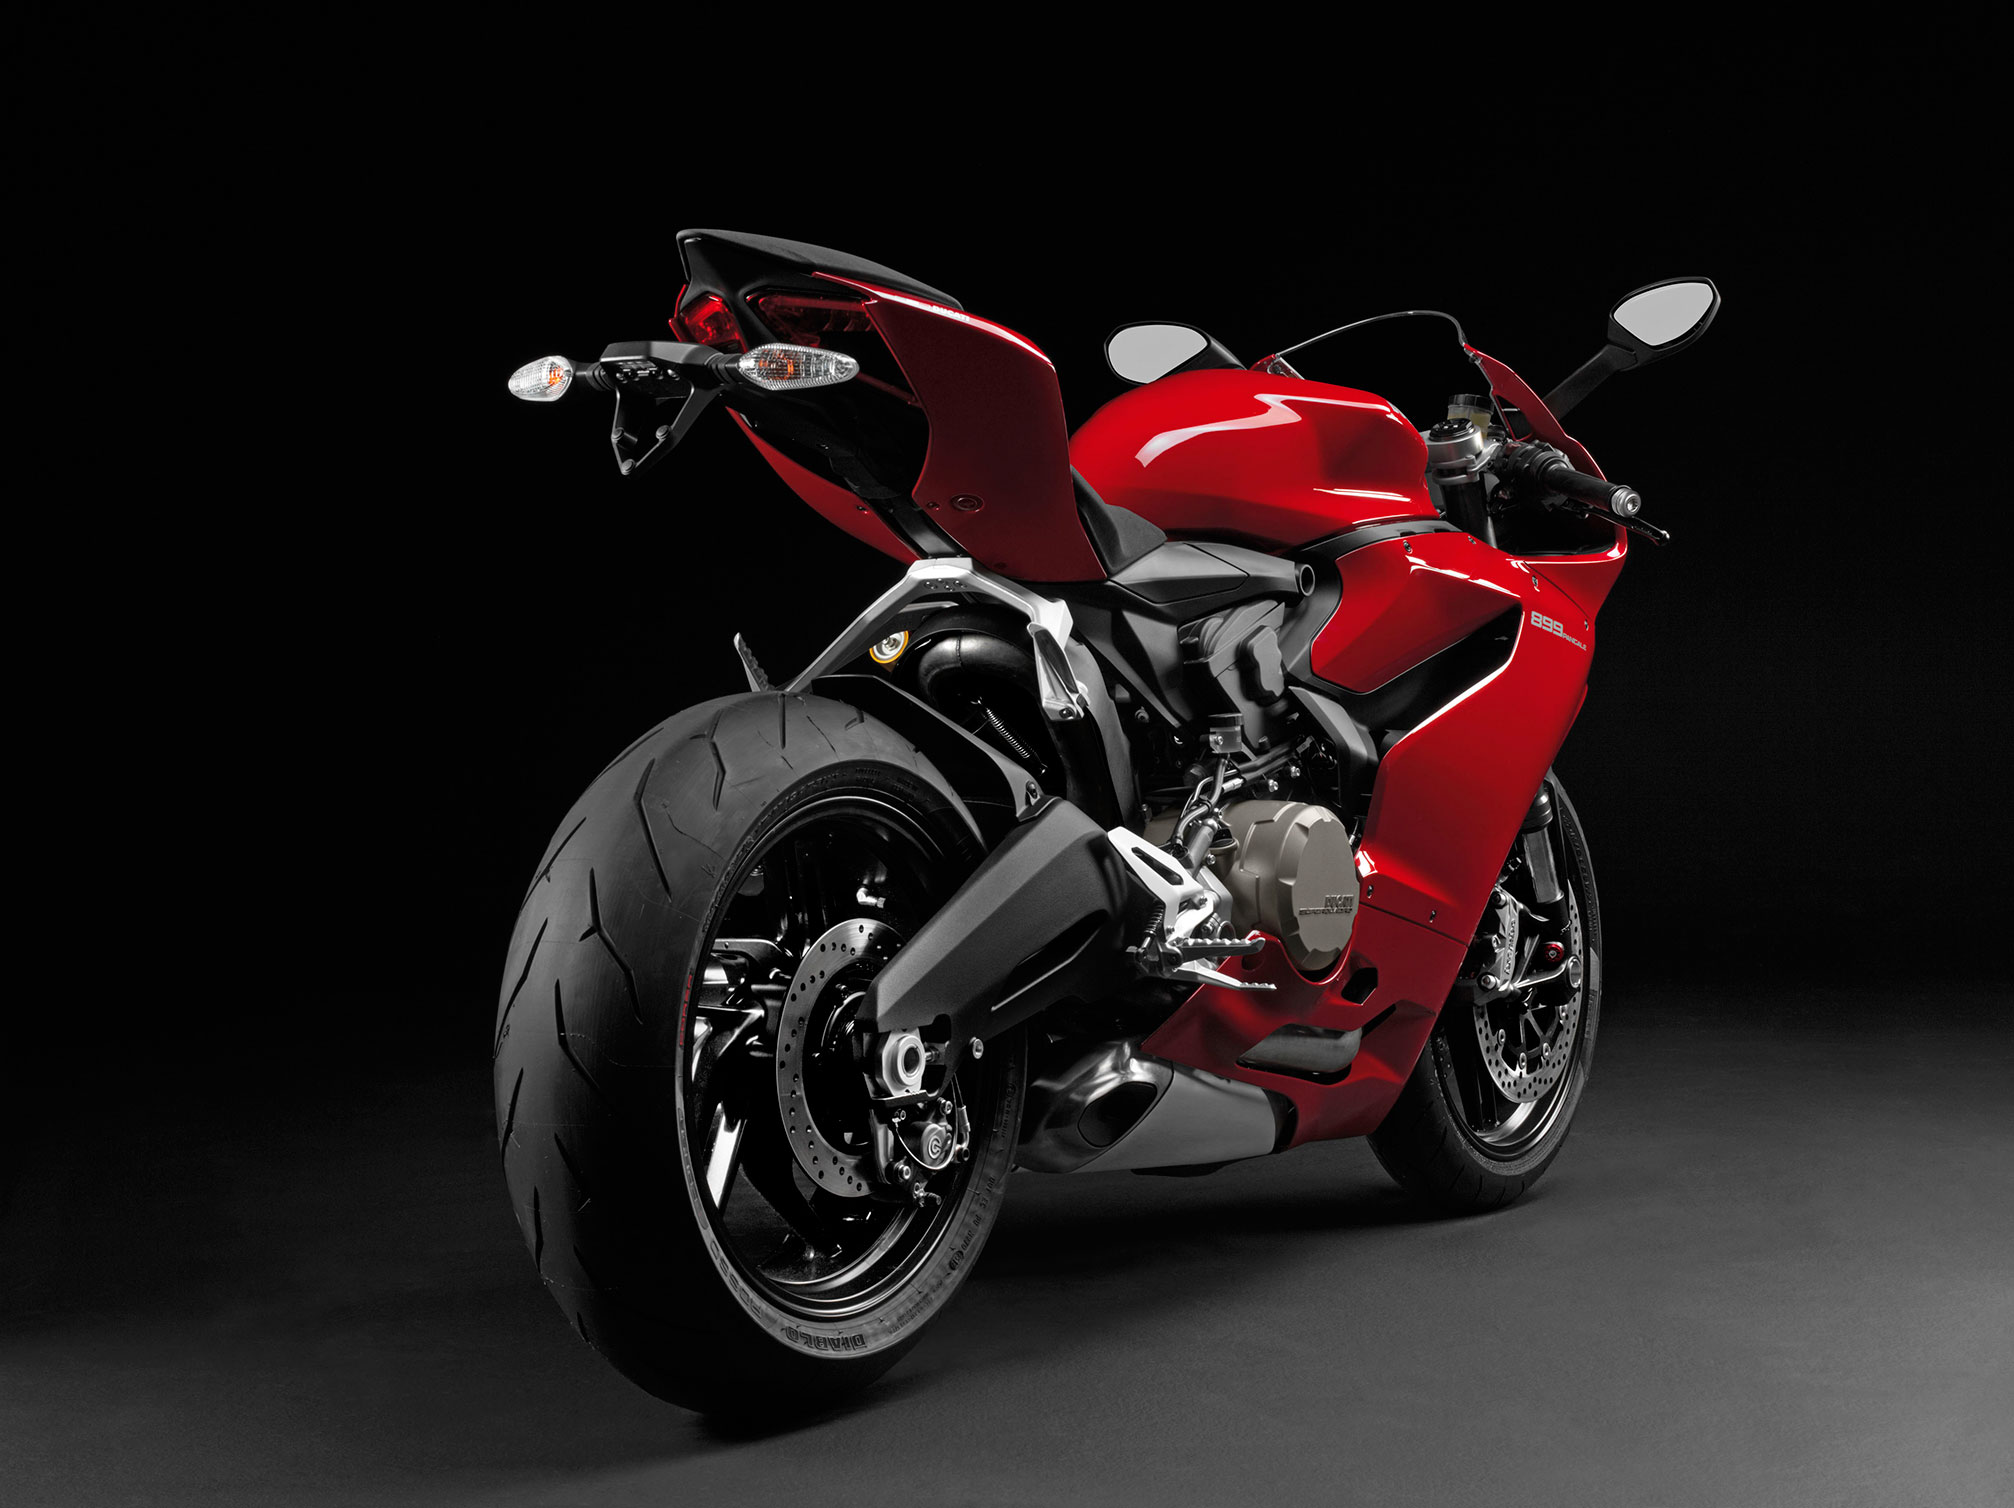 2014 Ducati Superbike 899 Panigale g wallpaper 2014x1508 150896 2014x1508